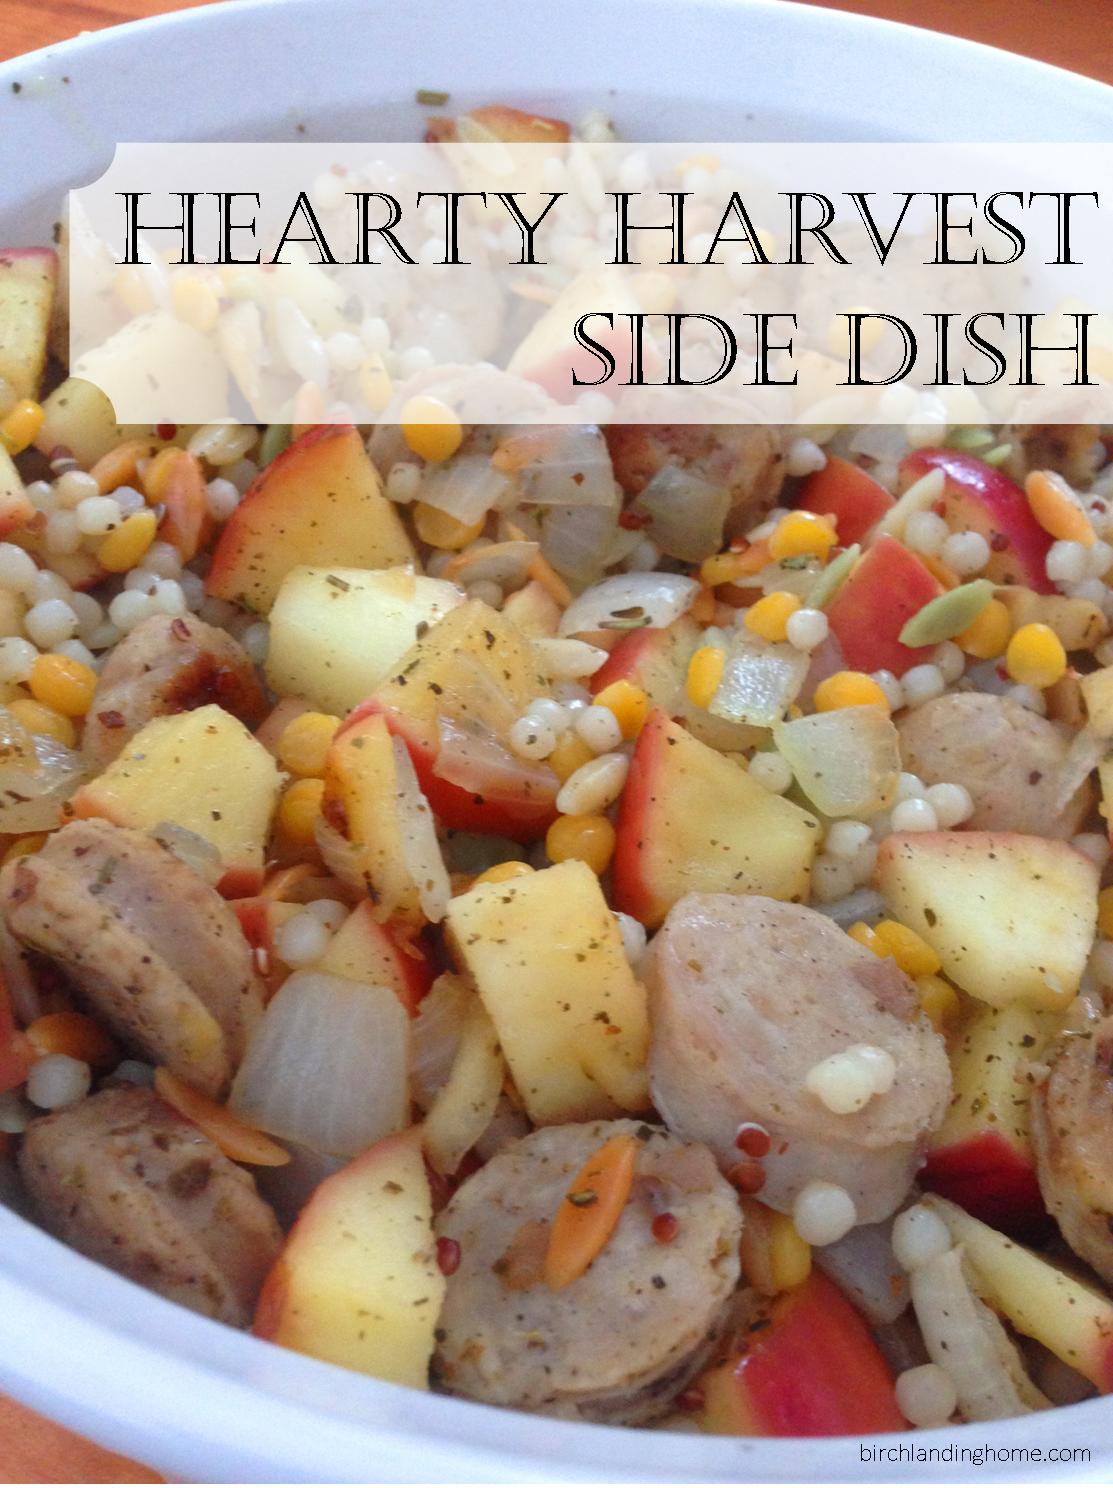 Hearty Harvest Side Dish Recipe - so good!